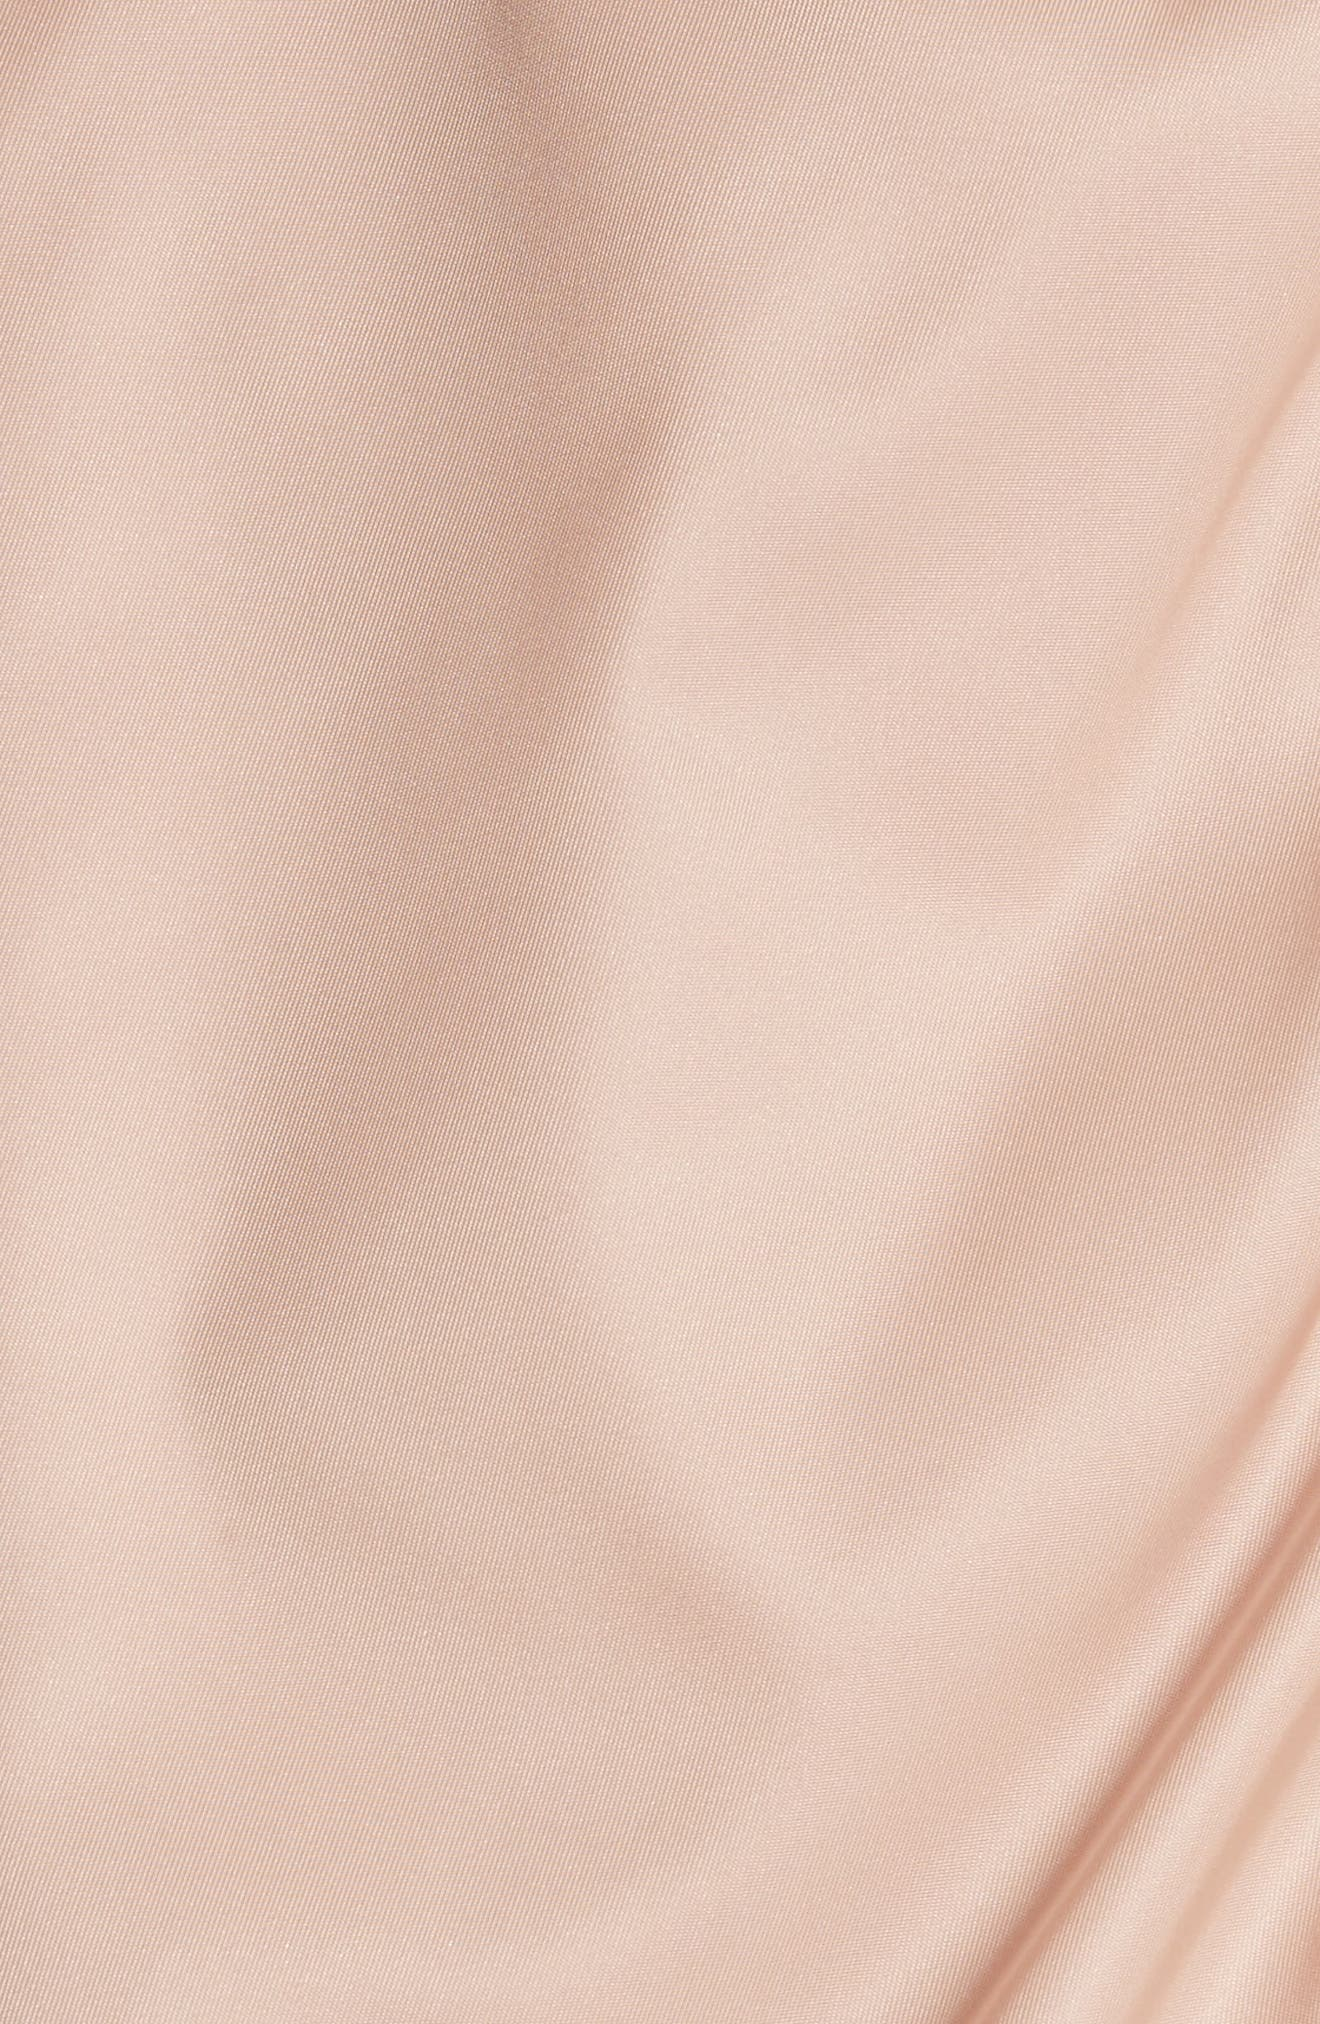 Aralia Layered Bomber Jacket,                             Alternate thumbnail 5, color,                             Pink